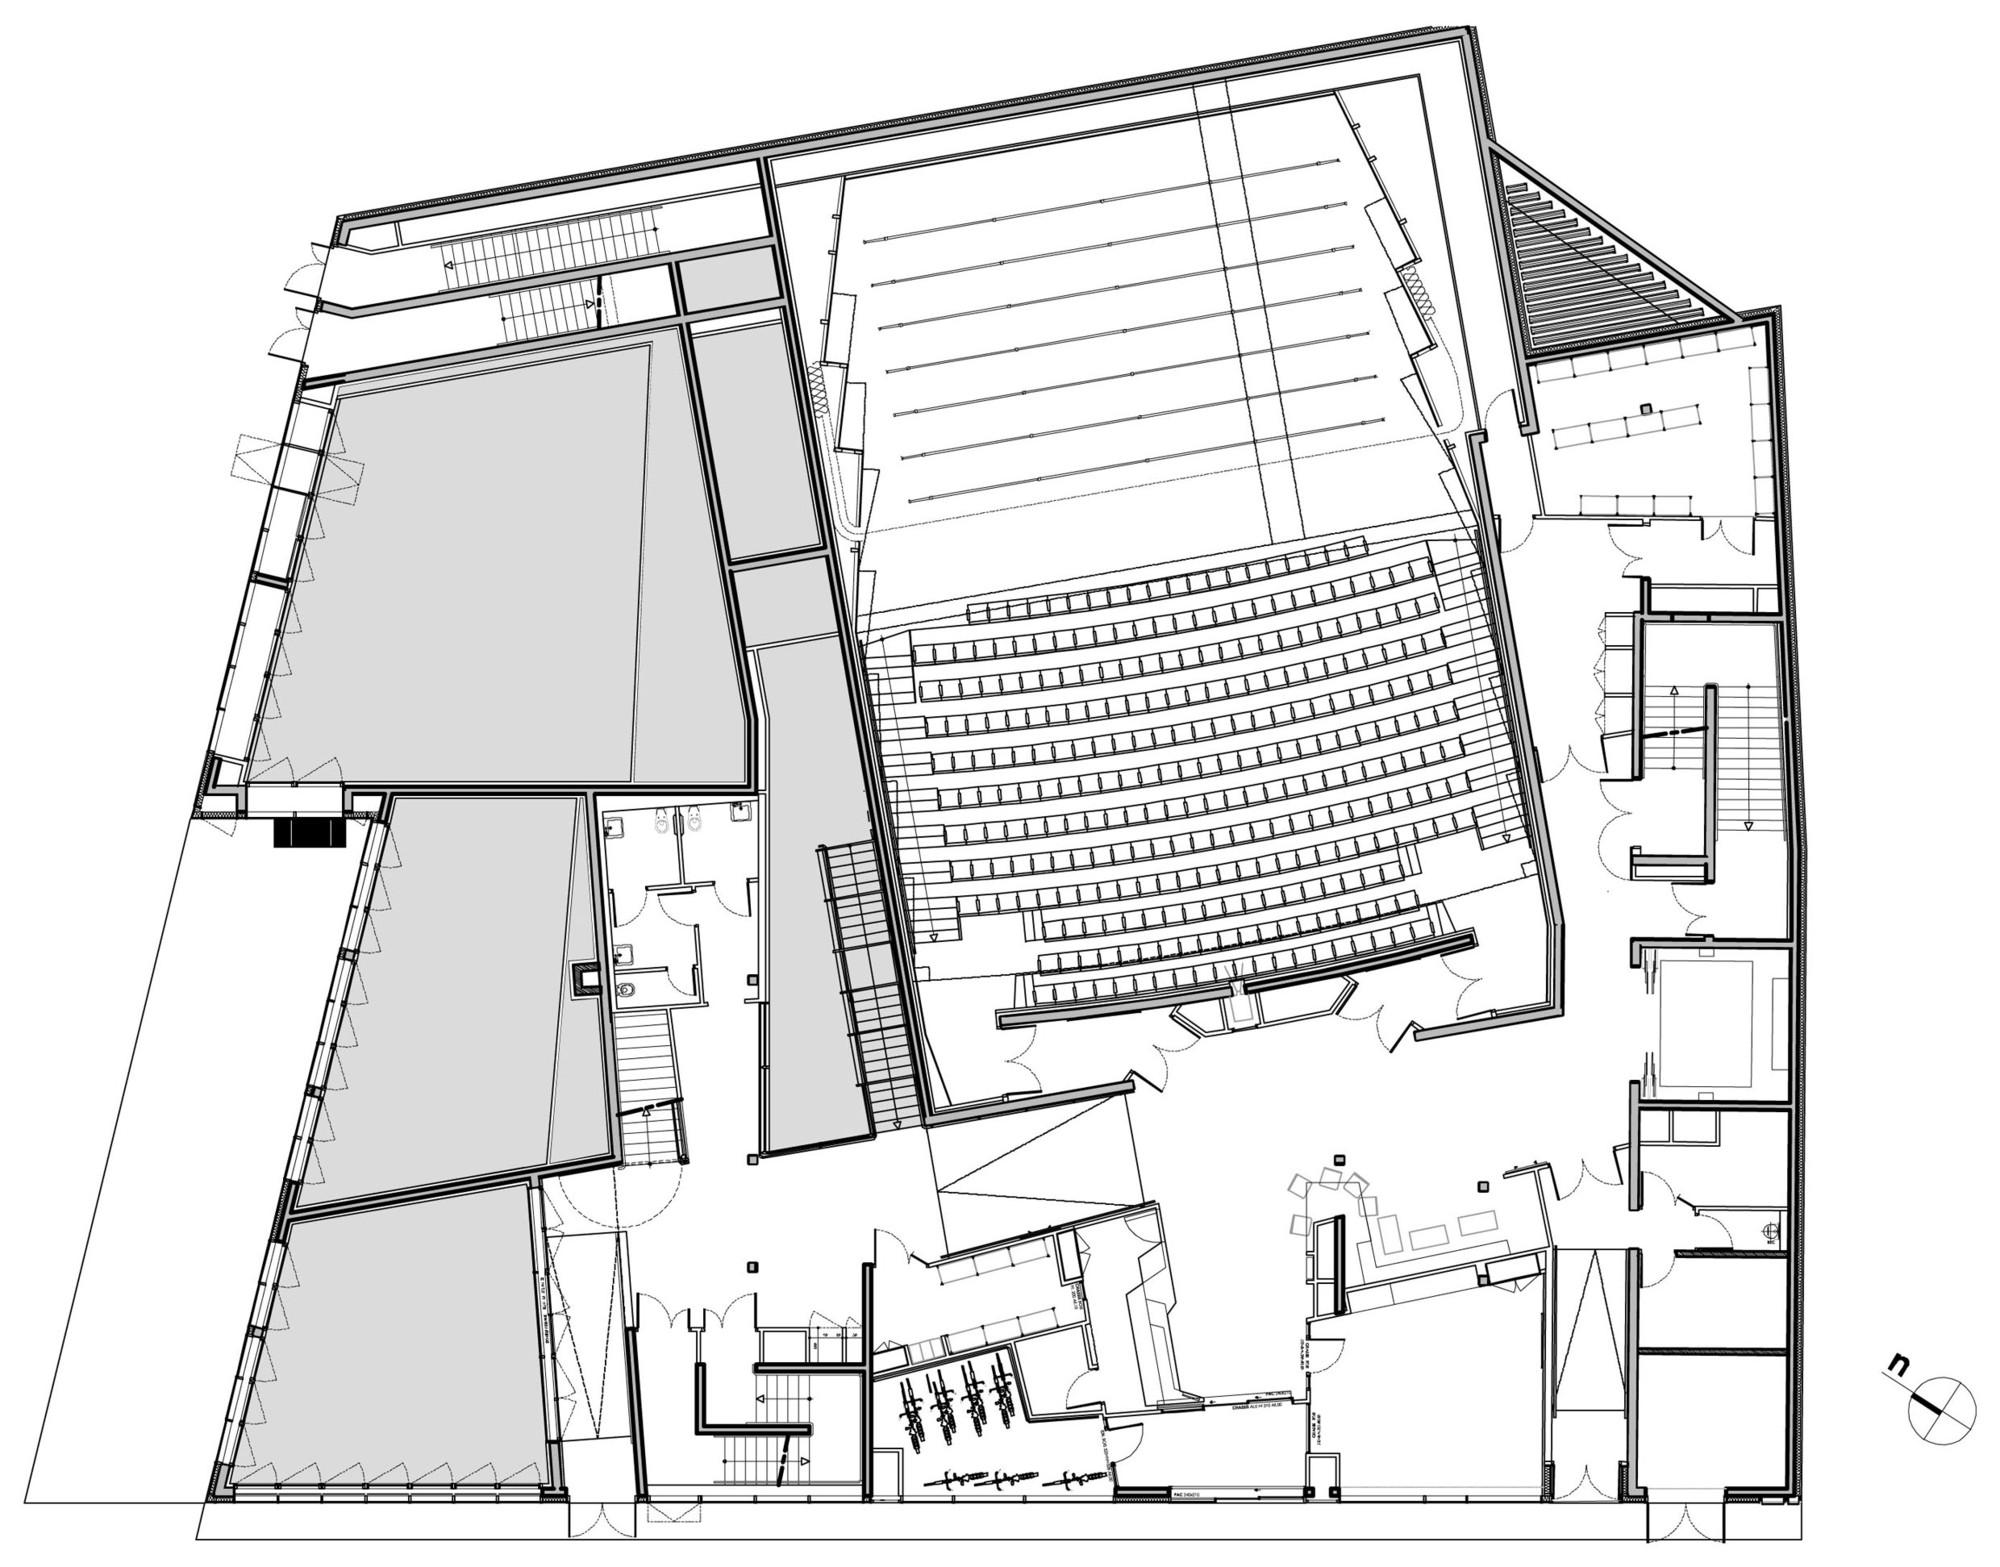 Music conservatory in paris 39 17th arrondissement basalt for Local builders house plans